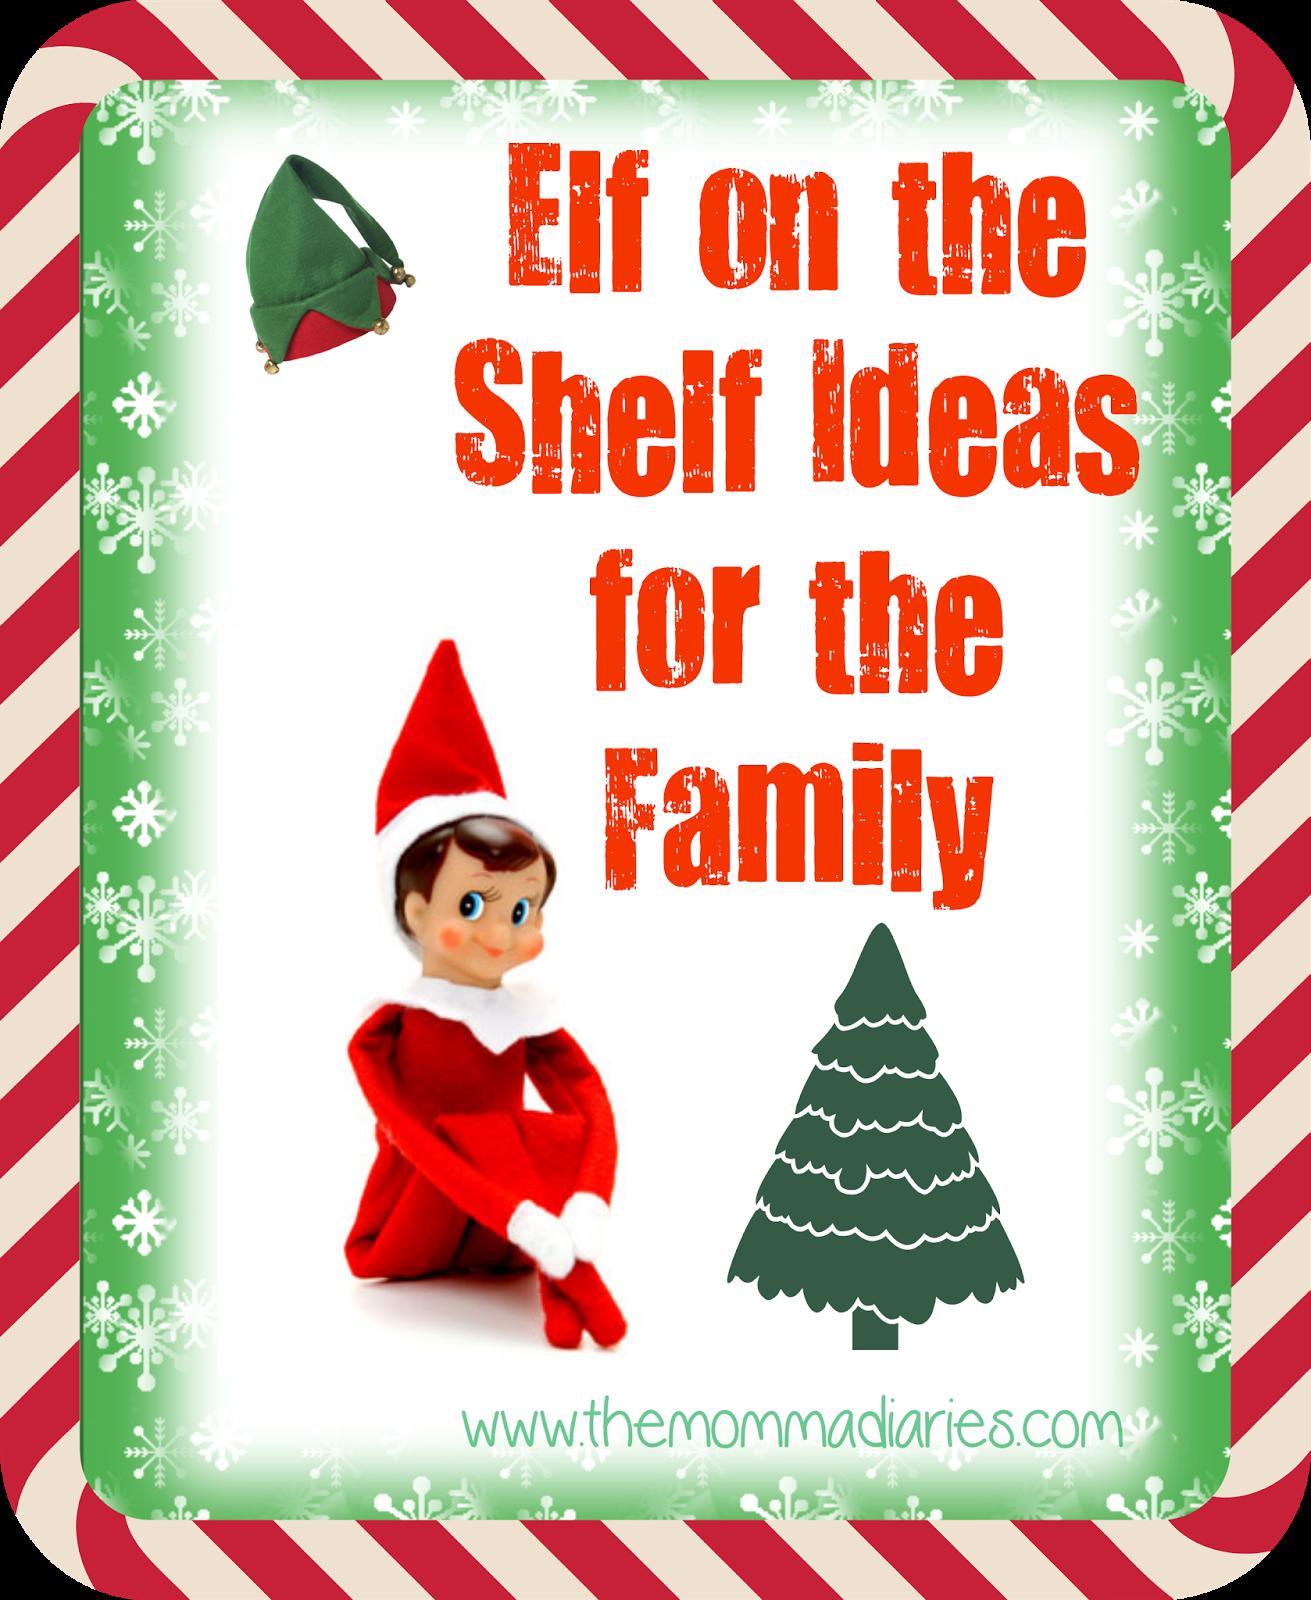 elf on the shelf #eots